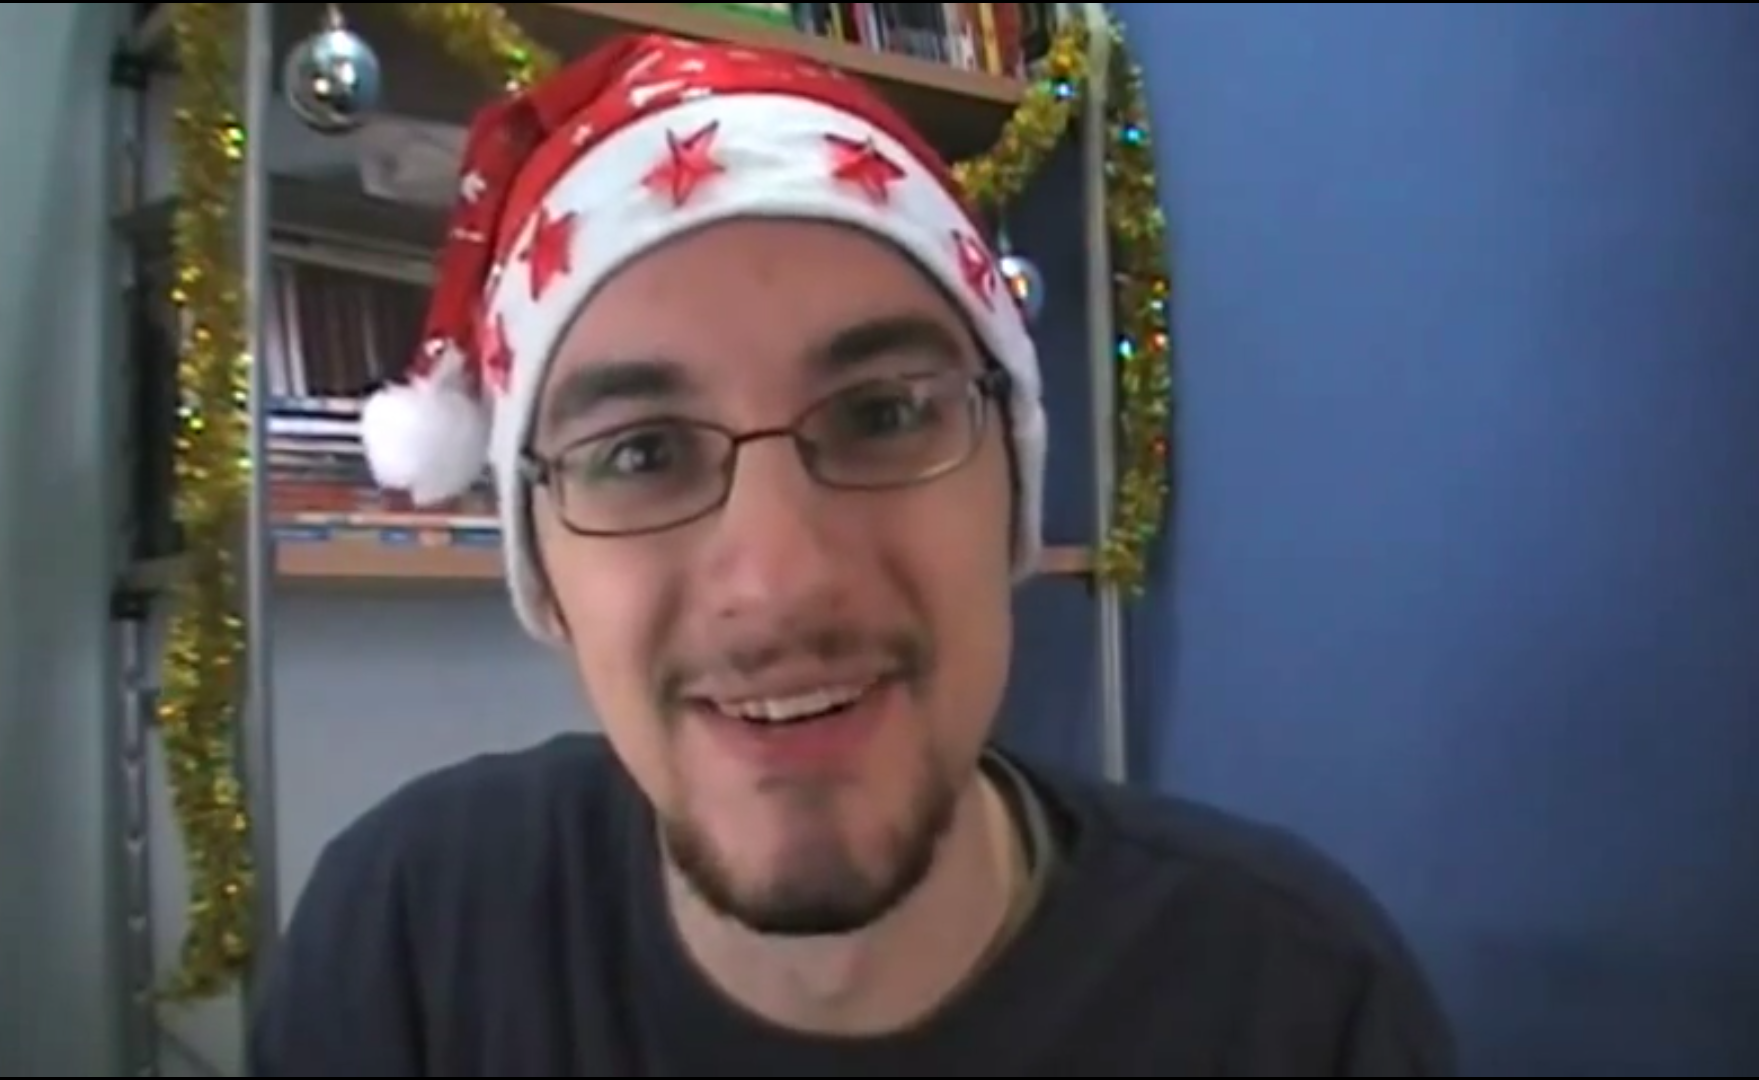 Natale yotobi